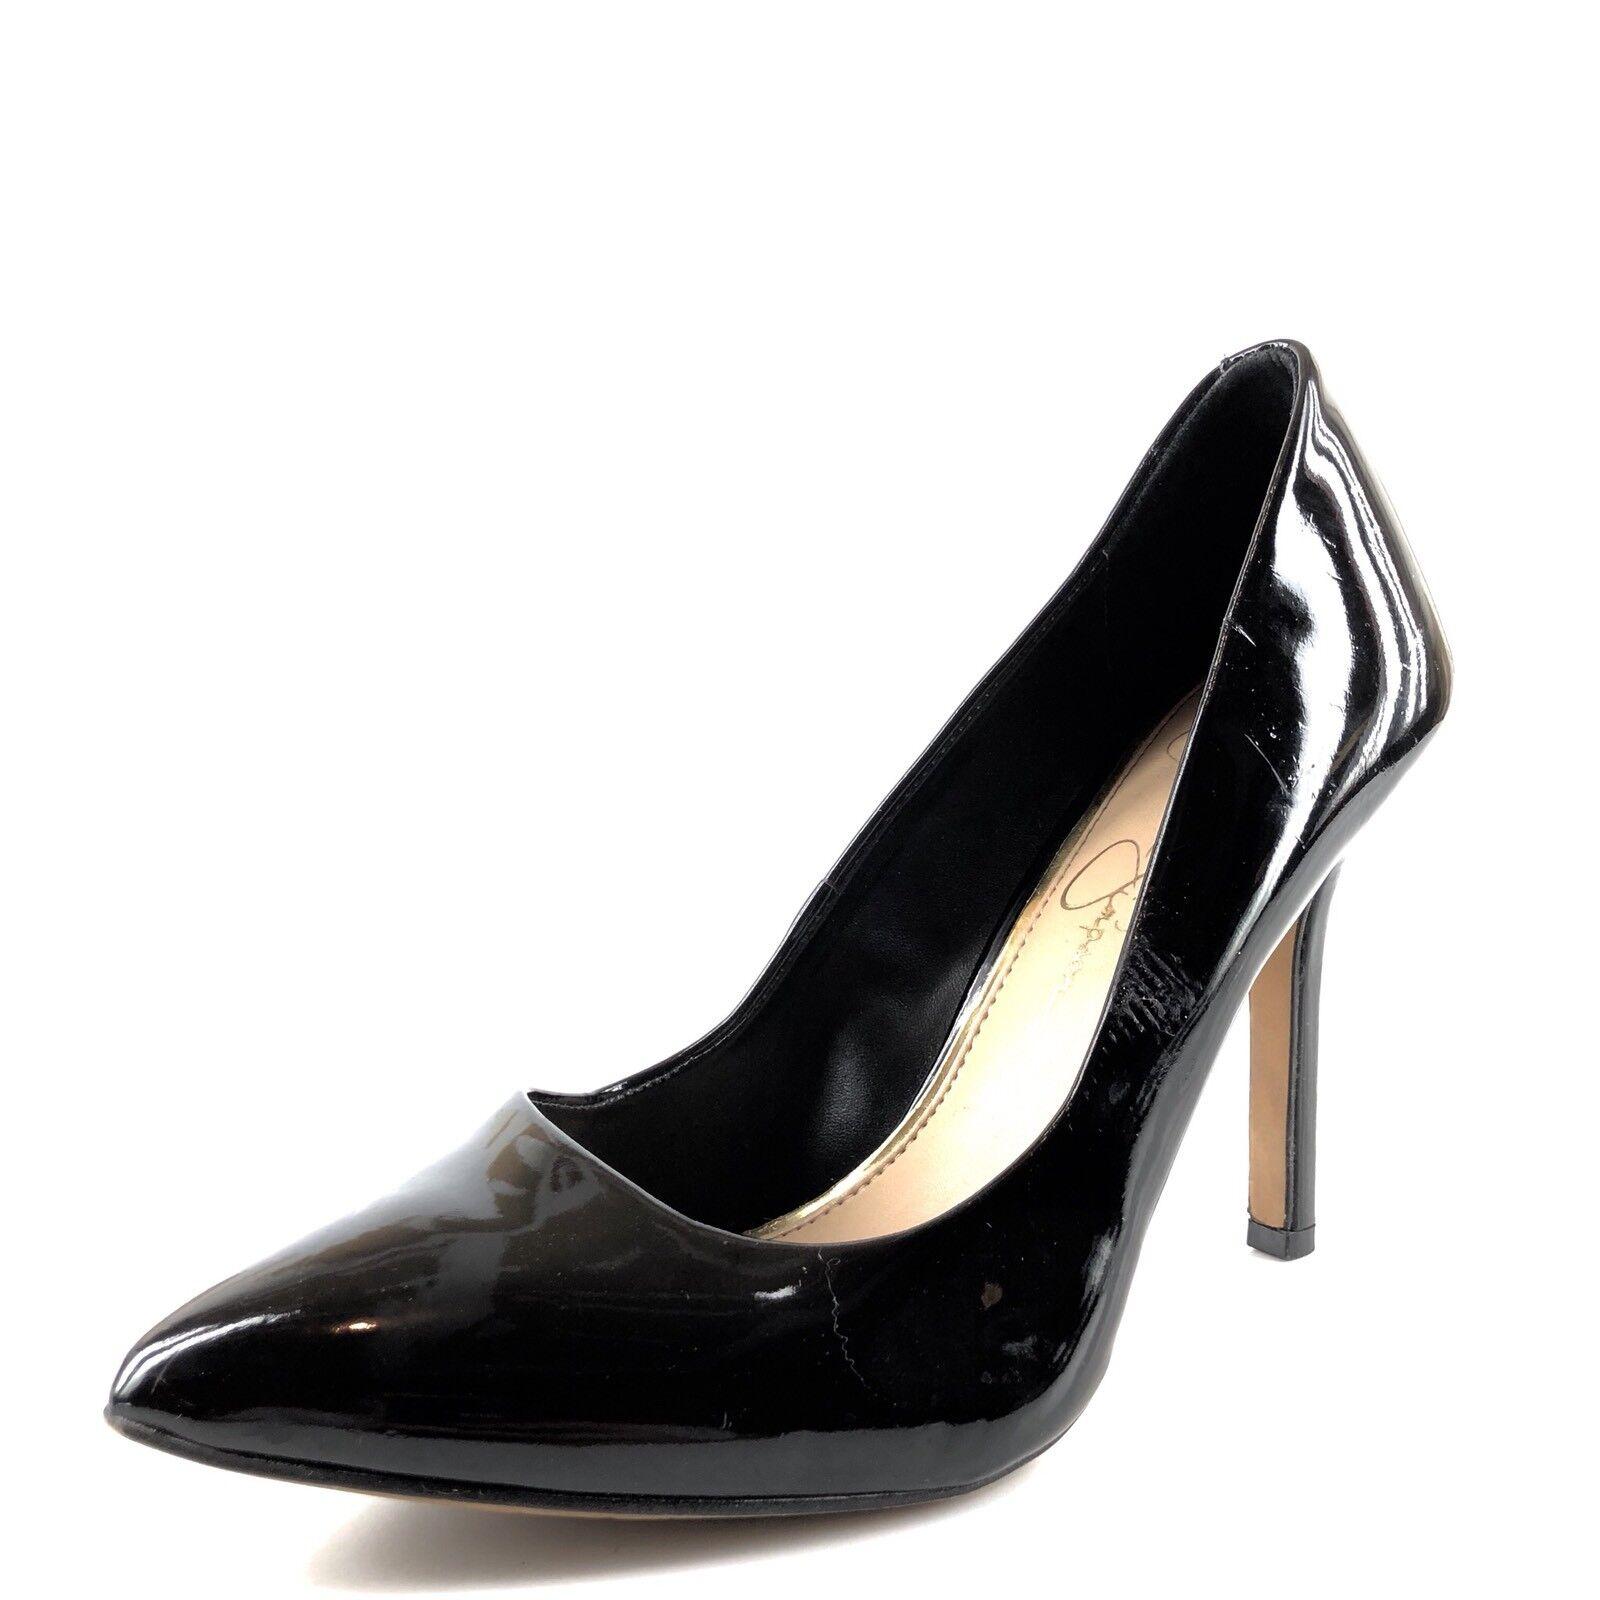 Jessica Simpson Adeni Black Patent Leather Classic Pumps Womens Size 7.5 M